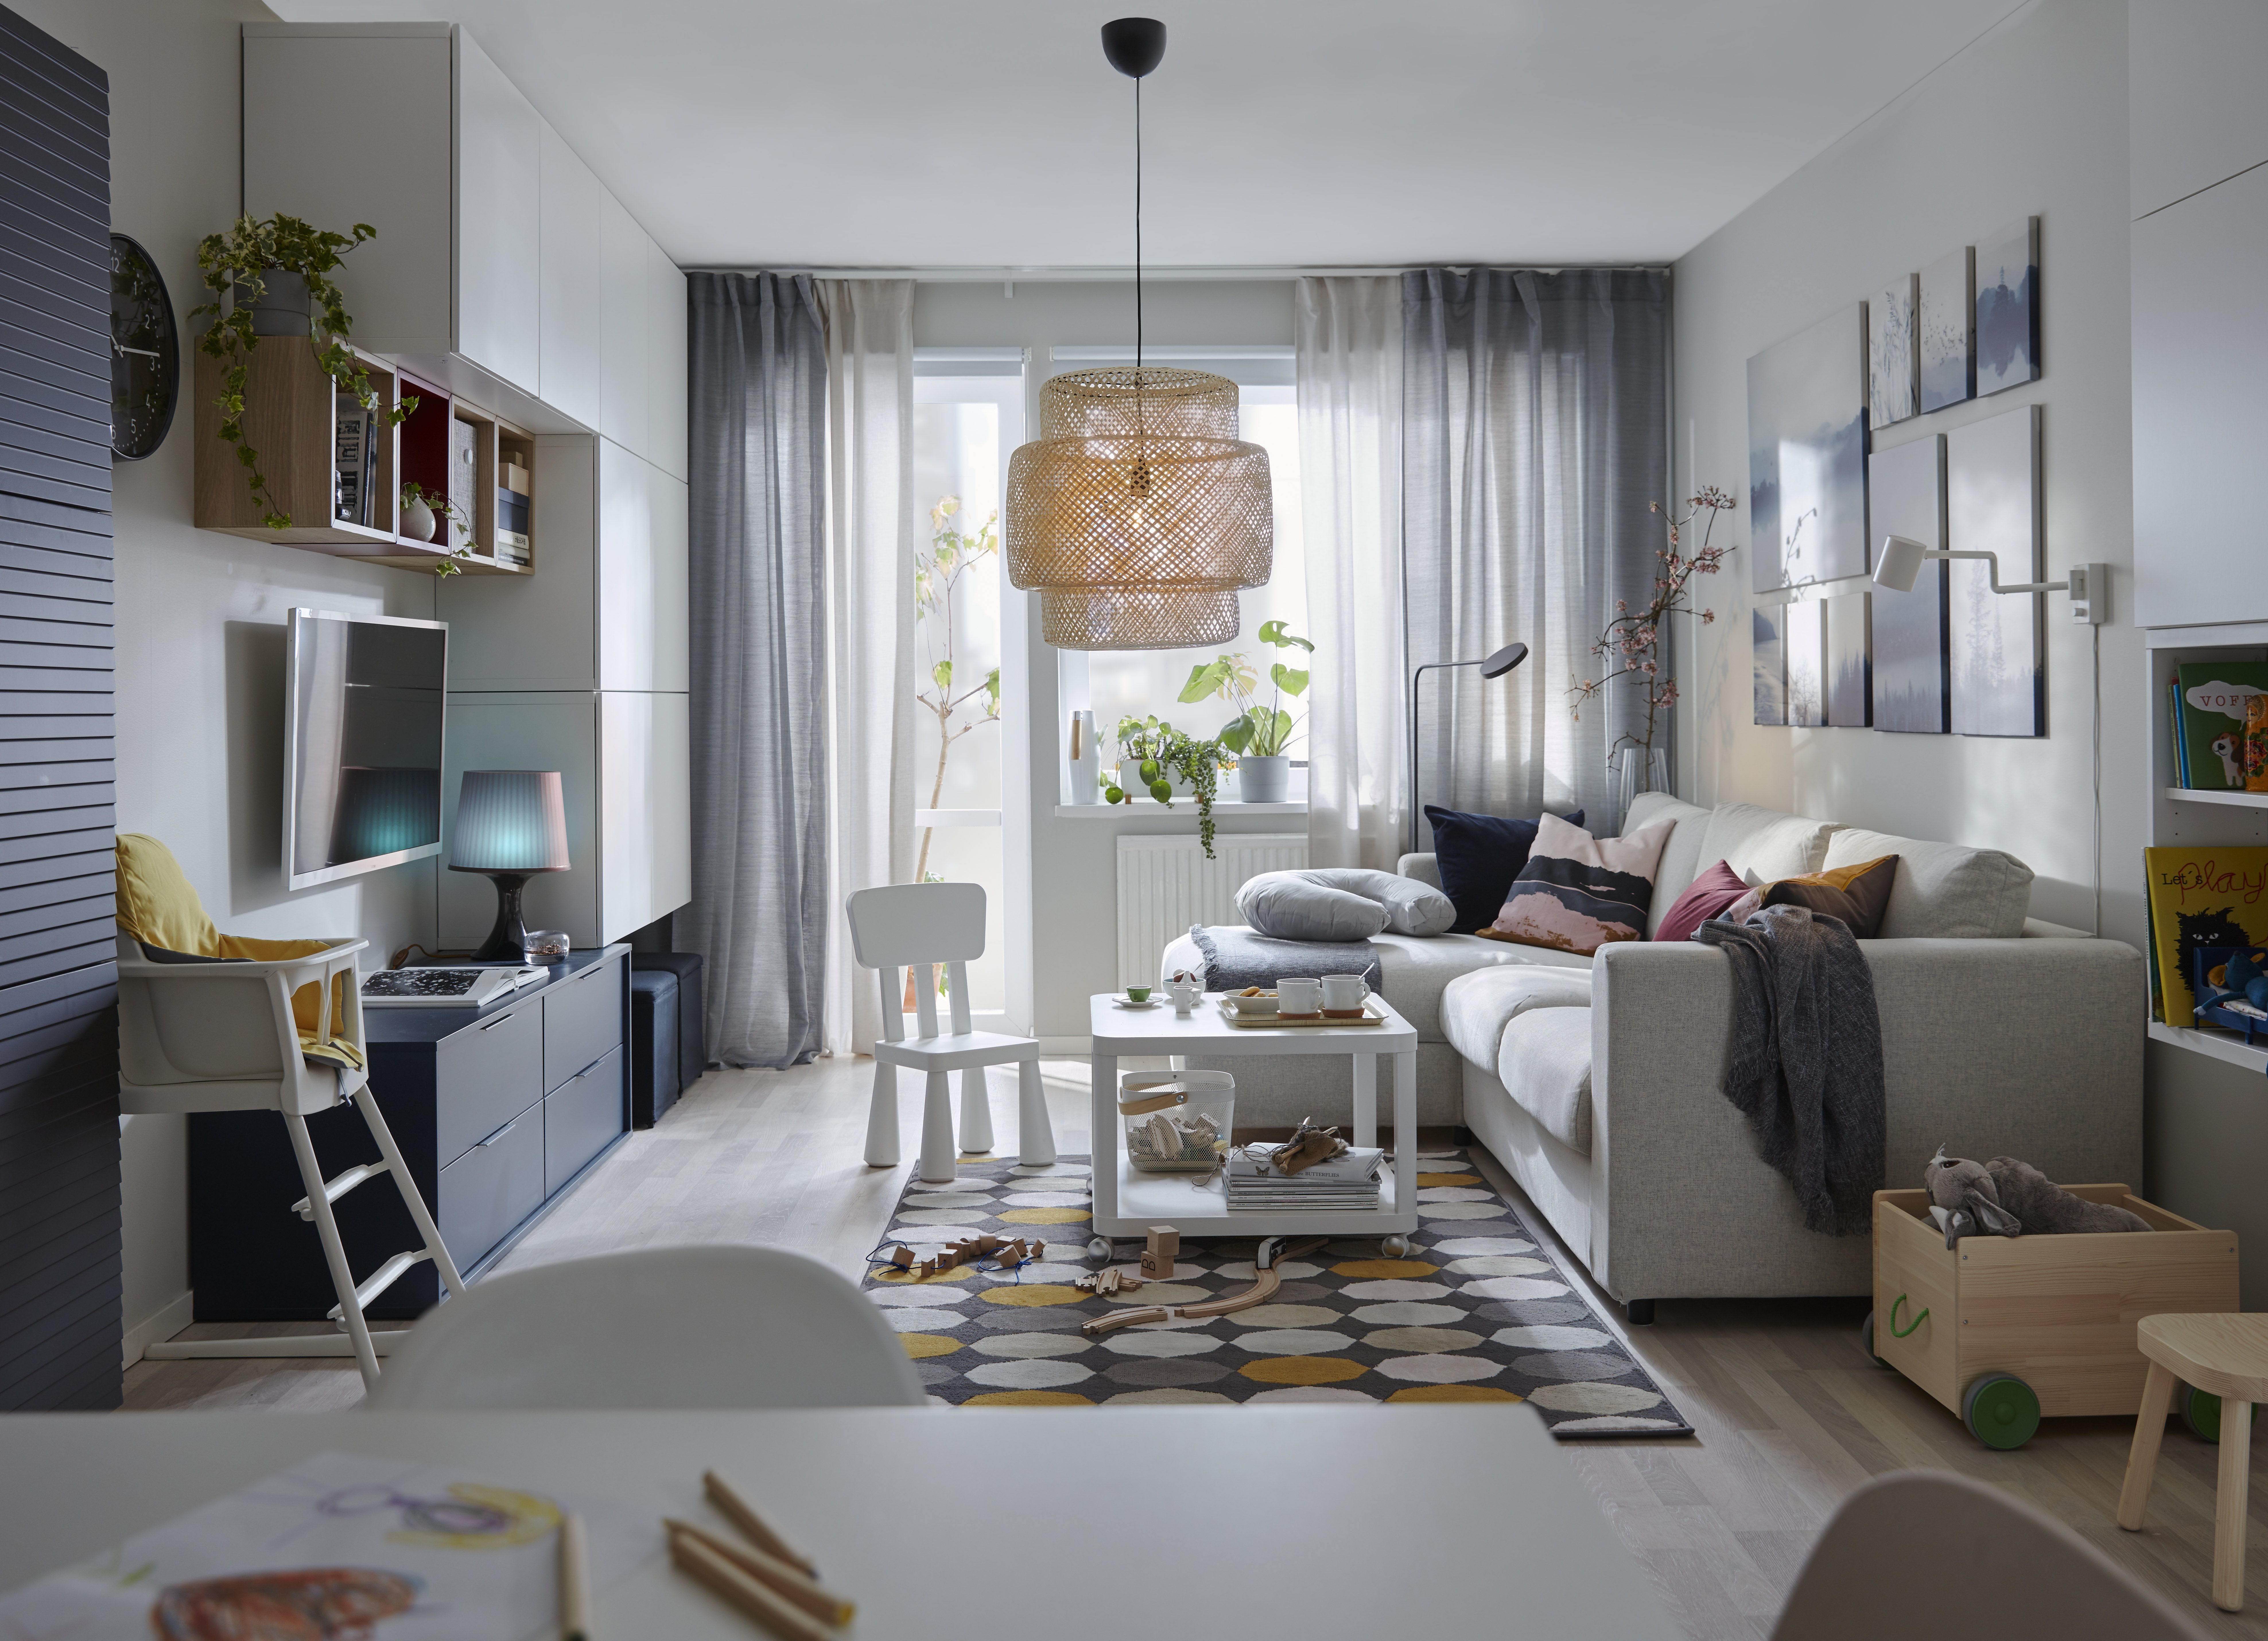 5 Ikea Design Ideas From Around The World Small Apartment Decorating Living Room Living Room Decor Minimalist Living Room Decor